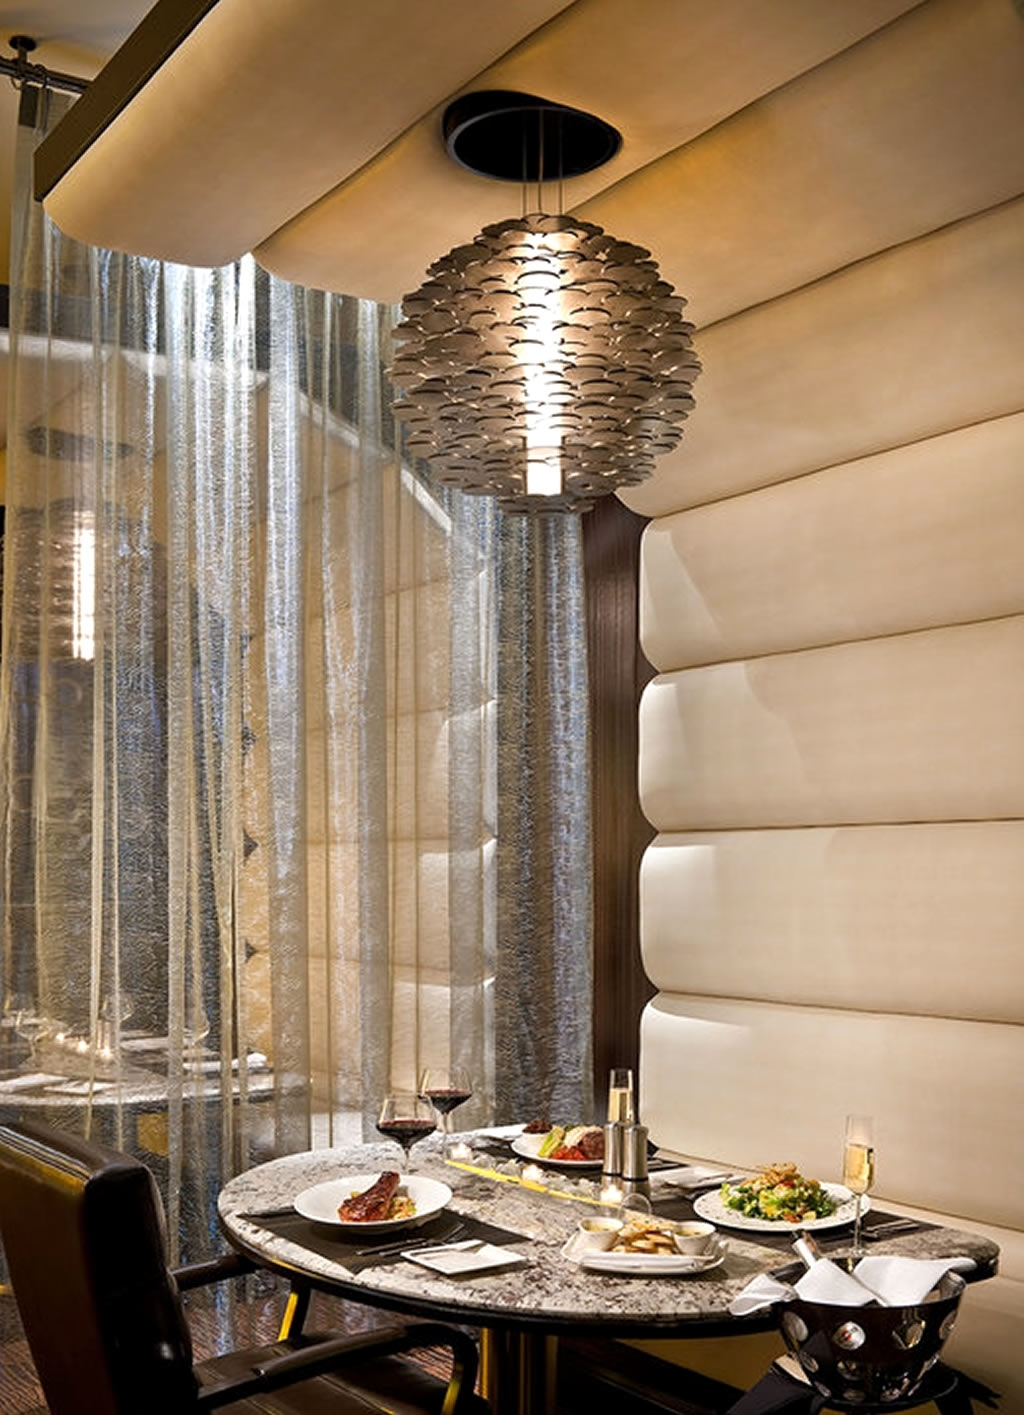 Restaurant Chandelier Within 2017 Restaurant Chandelier Lighting Design Of Atlantis Steakhouse, Reno (View 5 of 15)